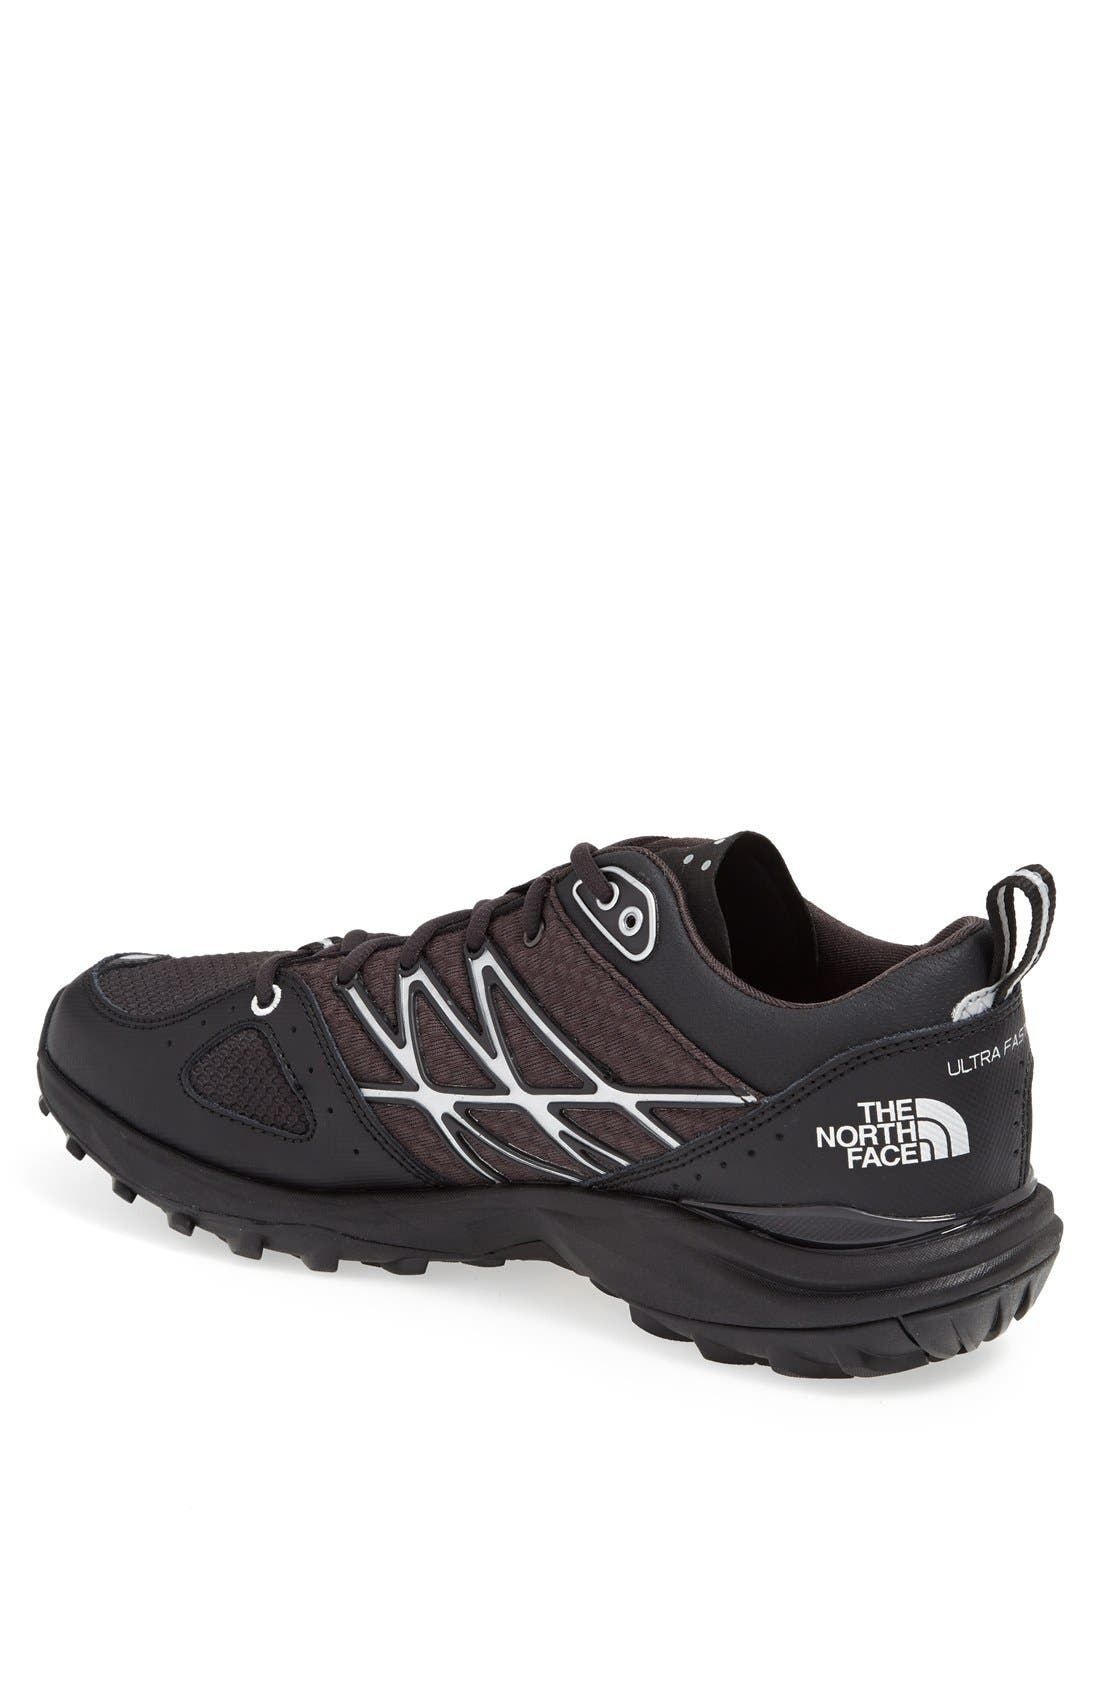 Alternate Image 2  - The North Face 'Ultra Fastpack' Hiking Shoe (Men)